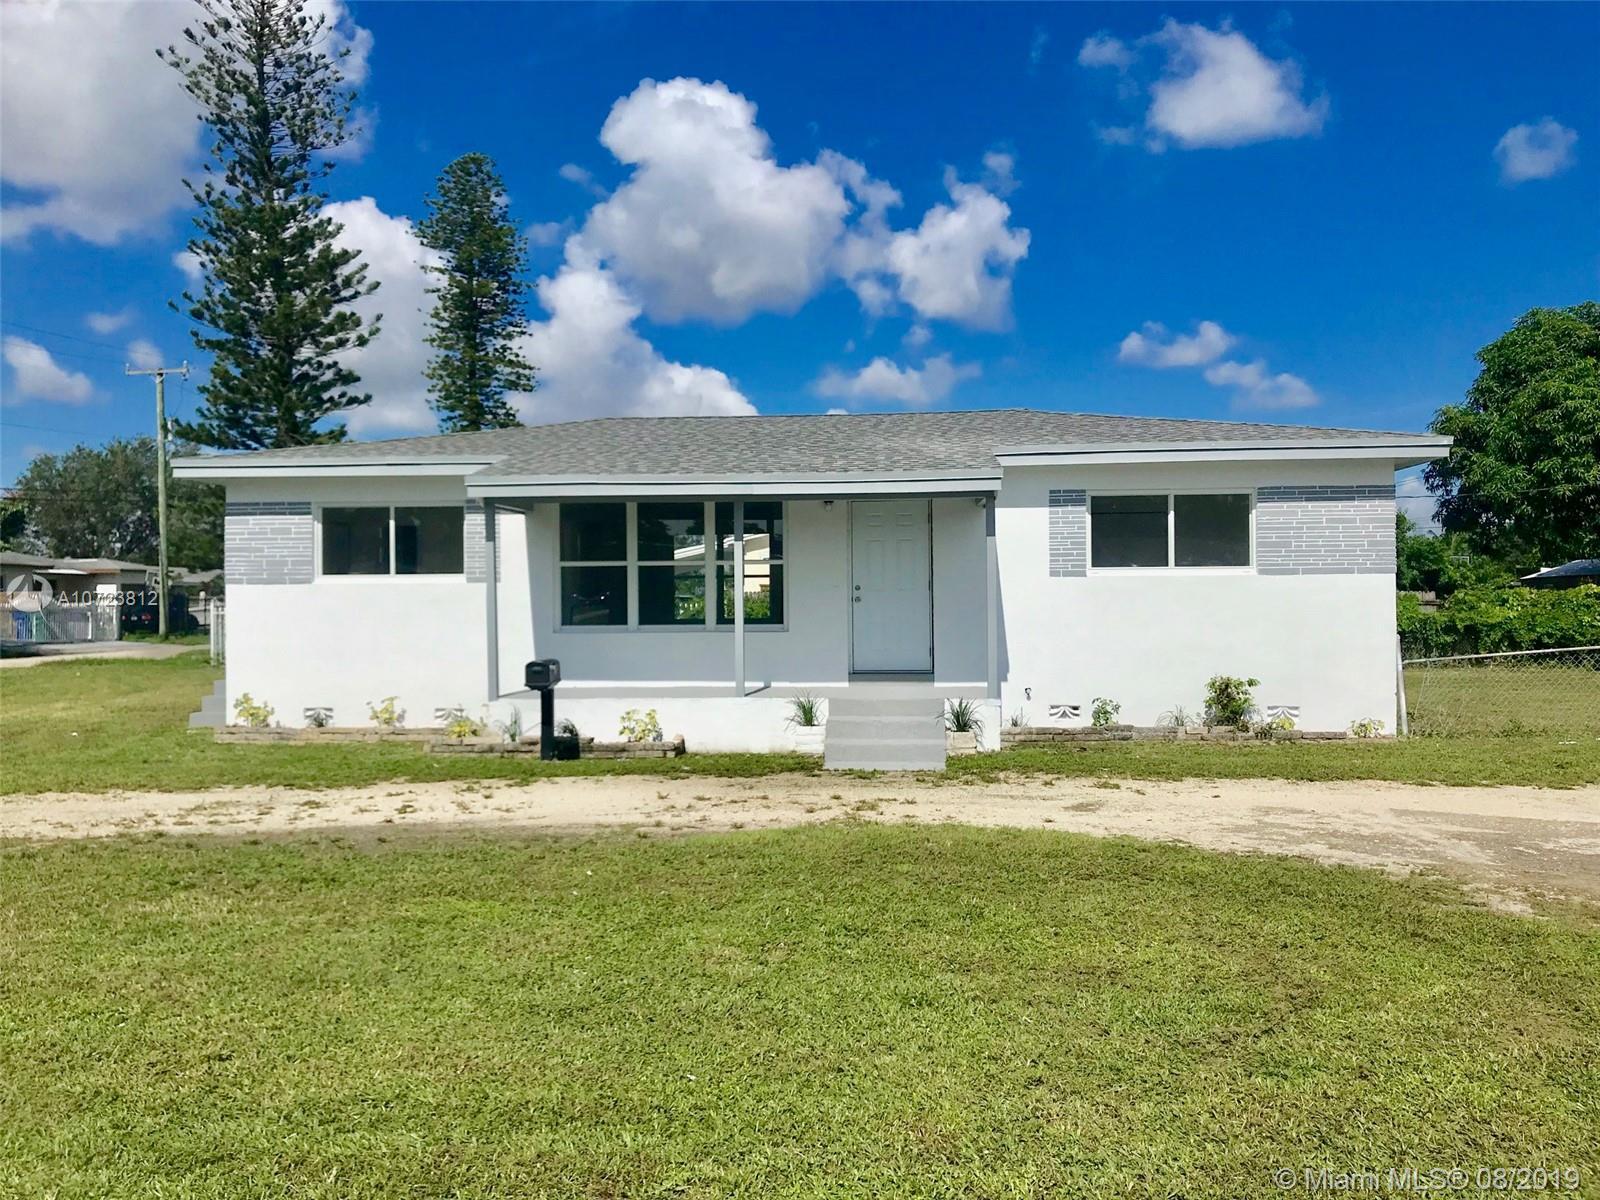 10700 NW 23rd Ave, Miami, FL 33167